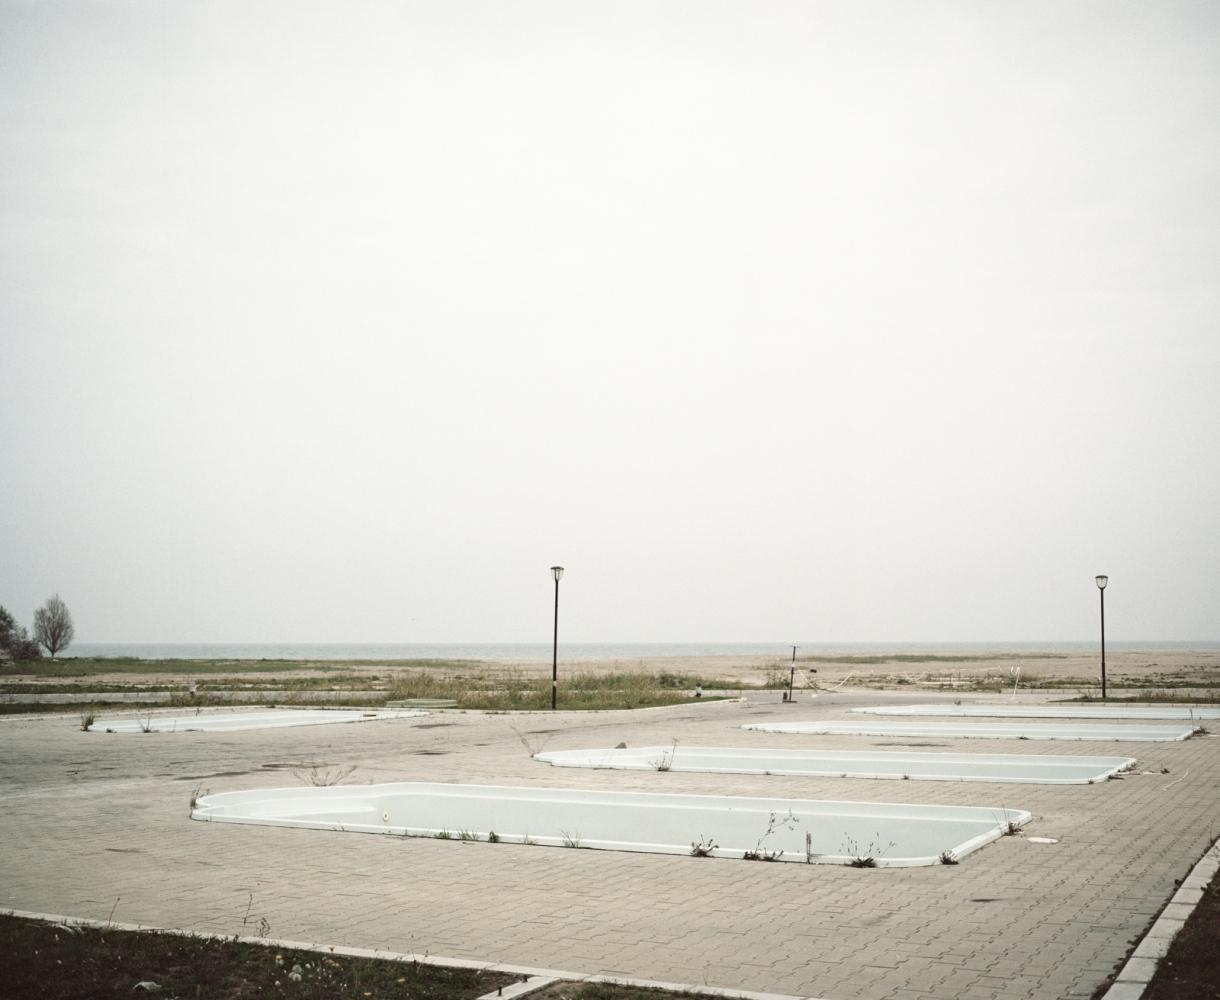 Romania, Eforie Nord. Empty swimming pools in a Black Sea resort